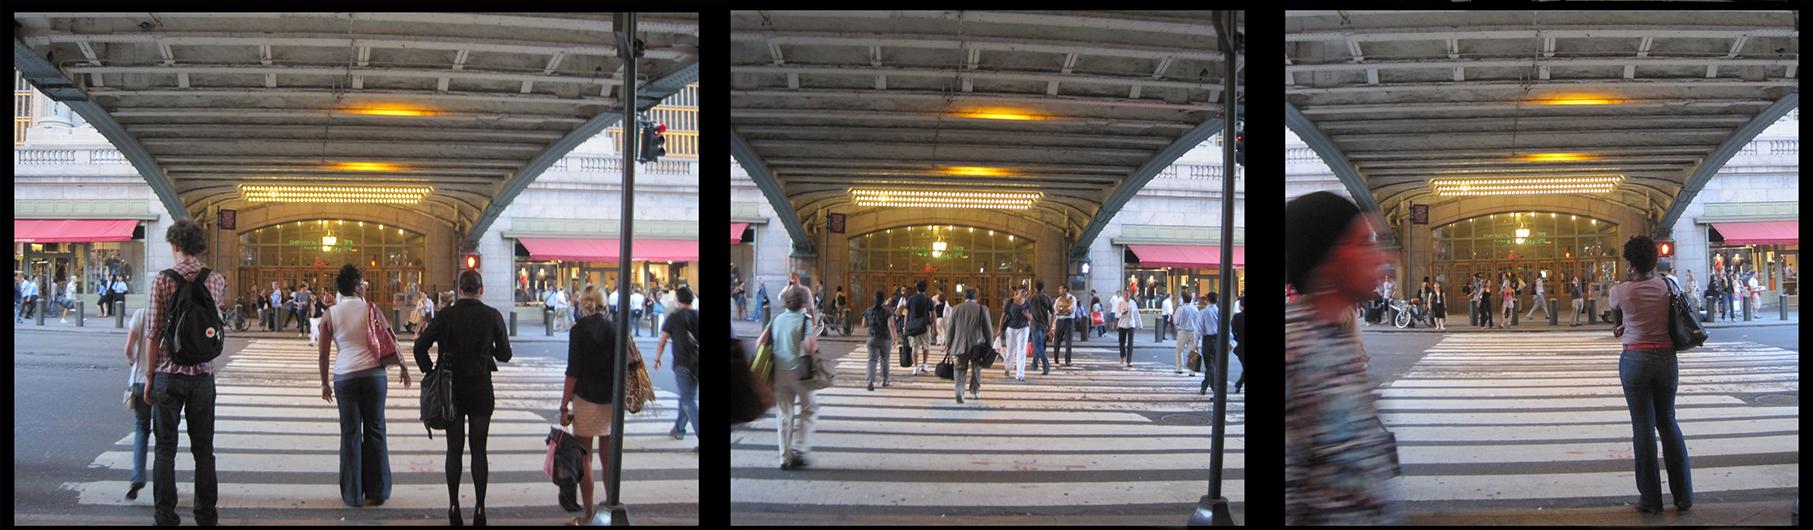 park-ave--e-42nd_4976041192_o.jpg